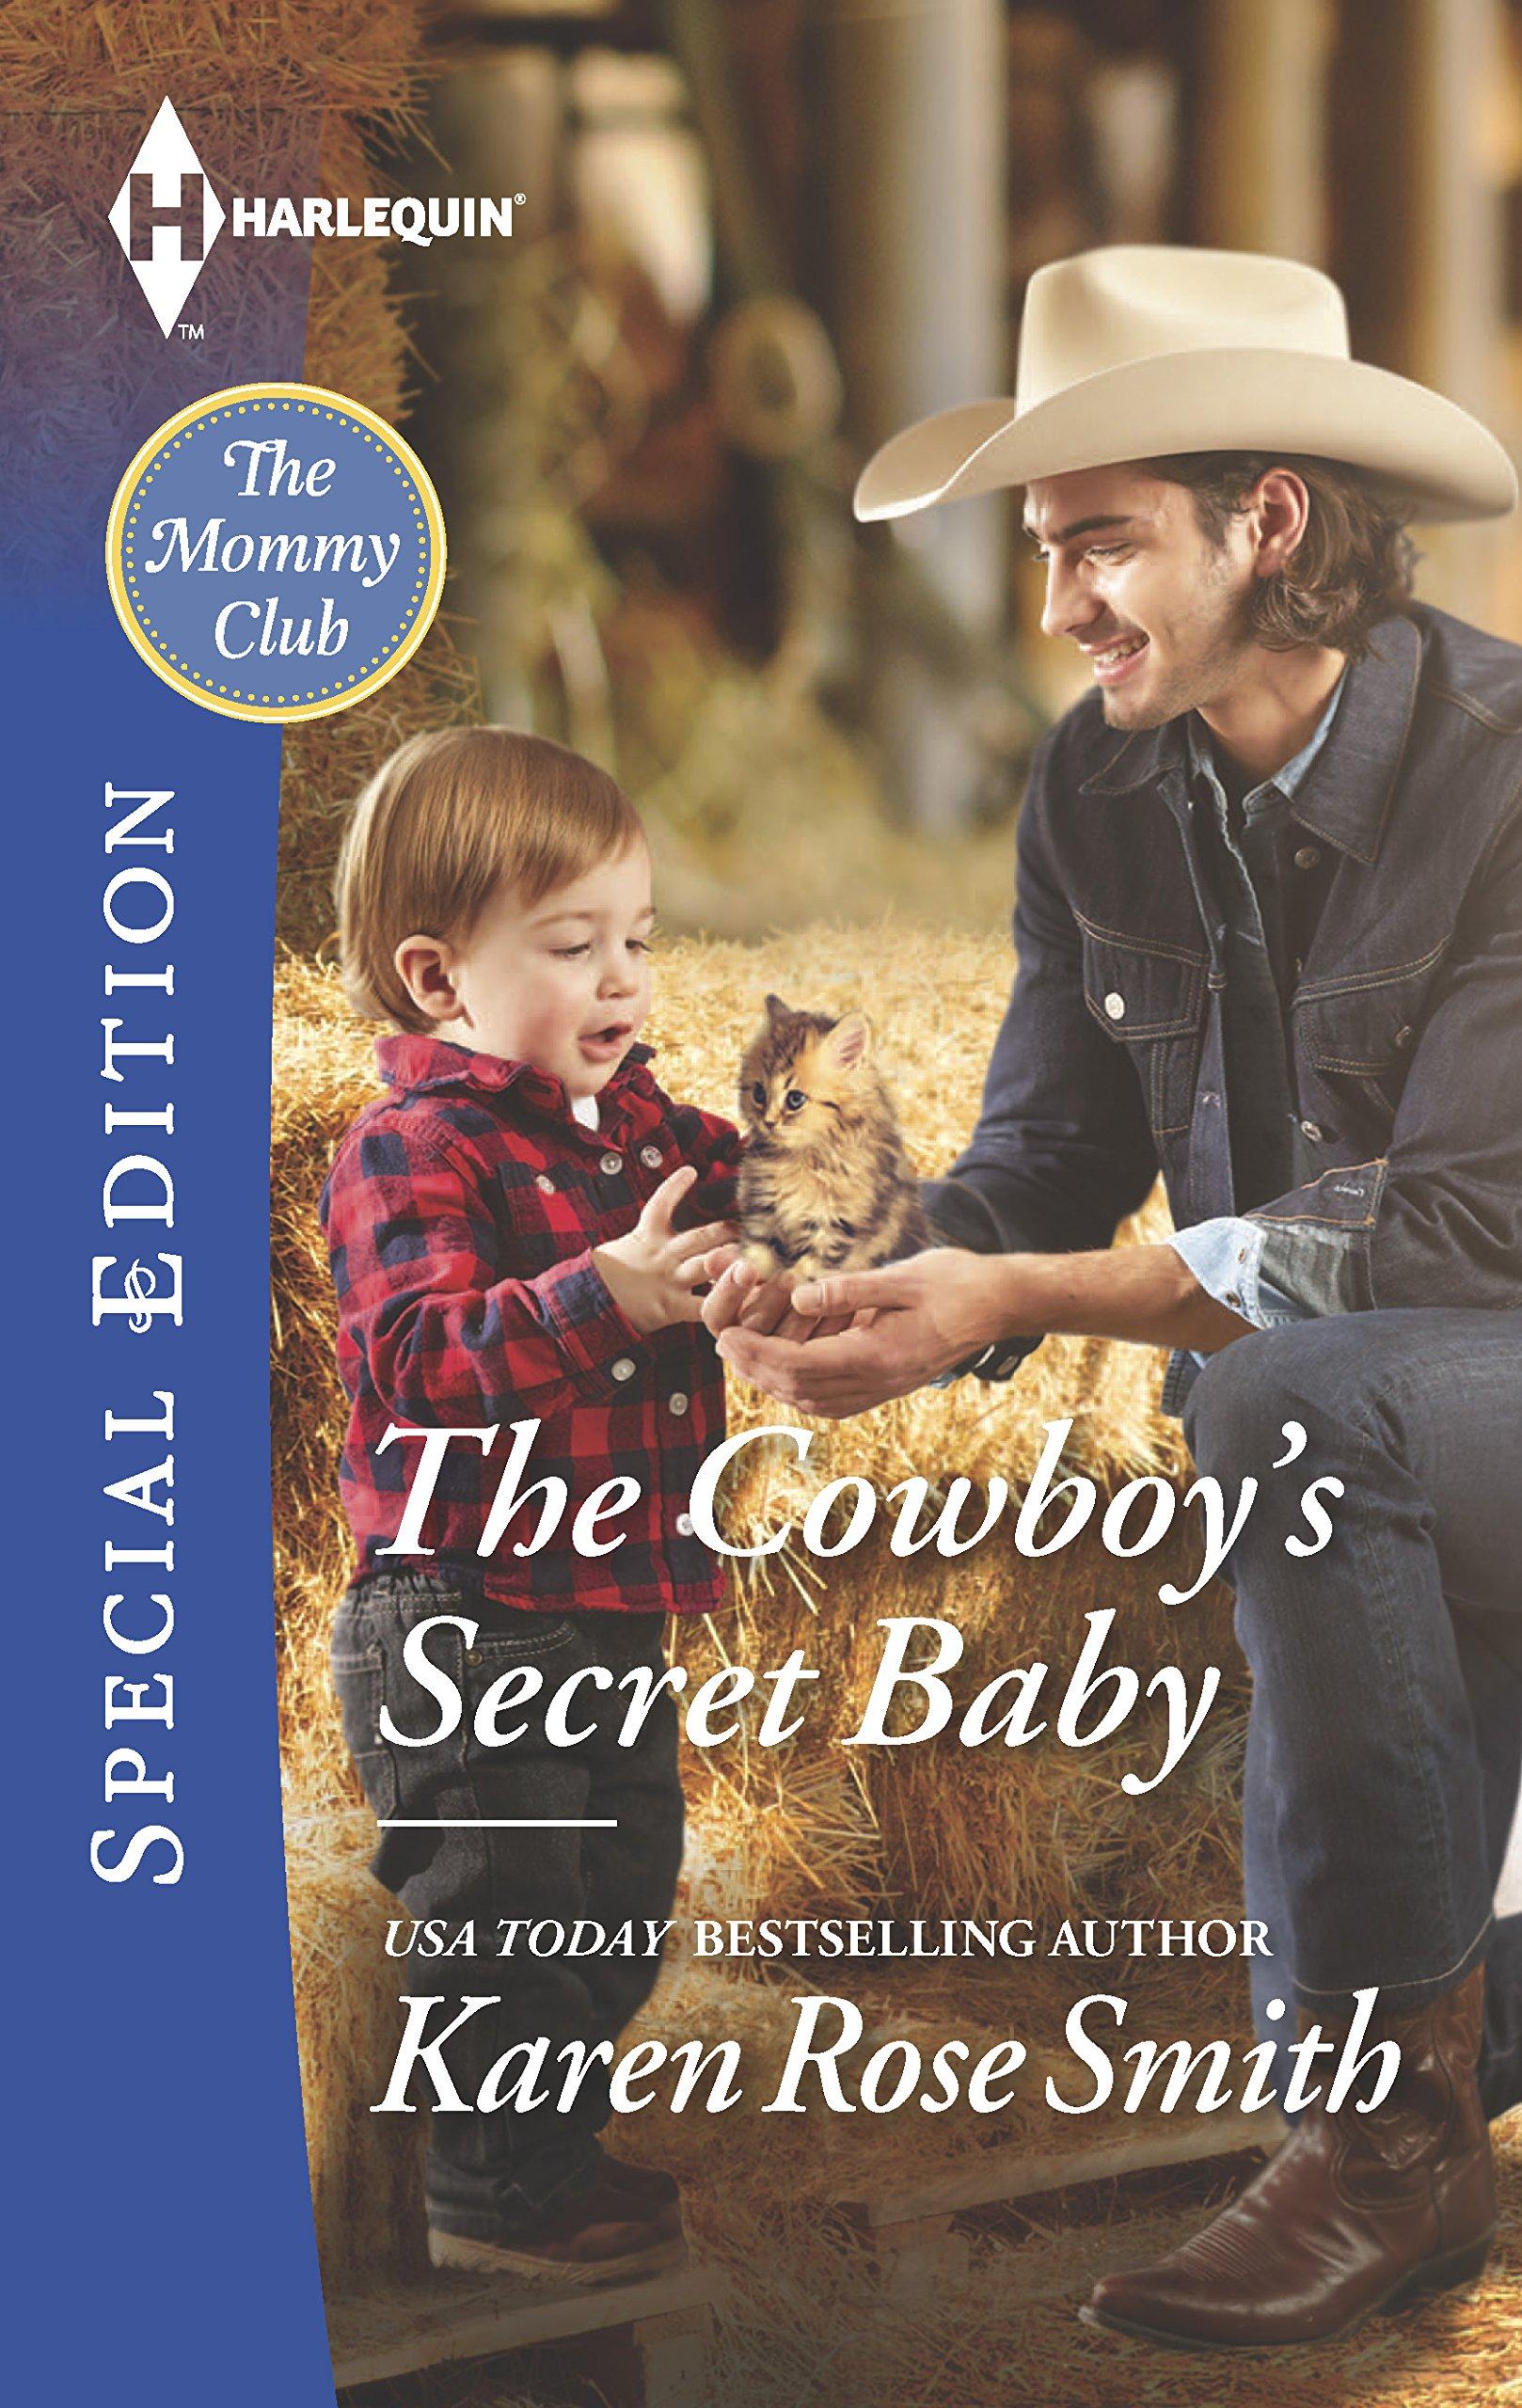 Download The Cowboy's Secret Baby (The Mommy Club) PDF ePub book